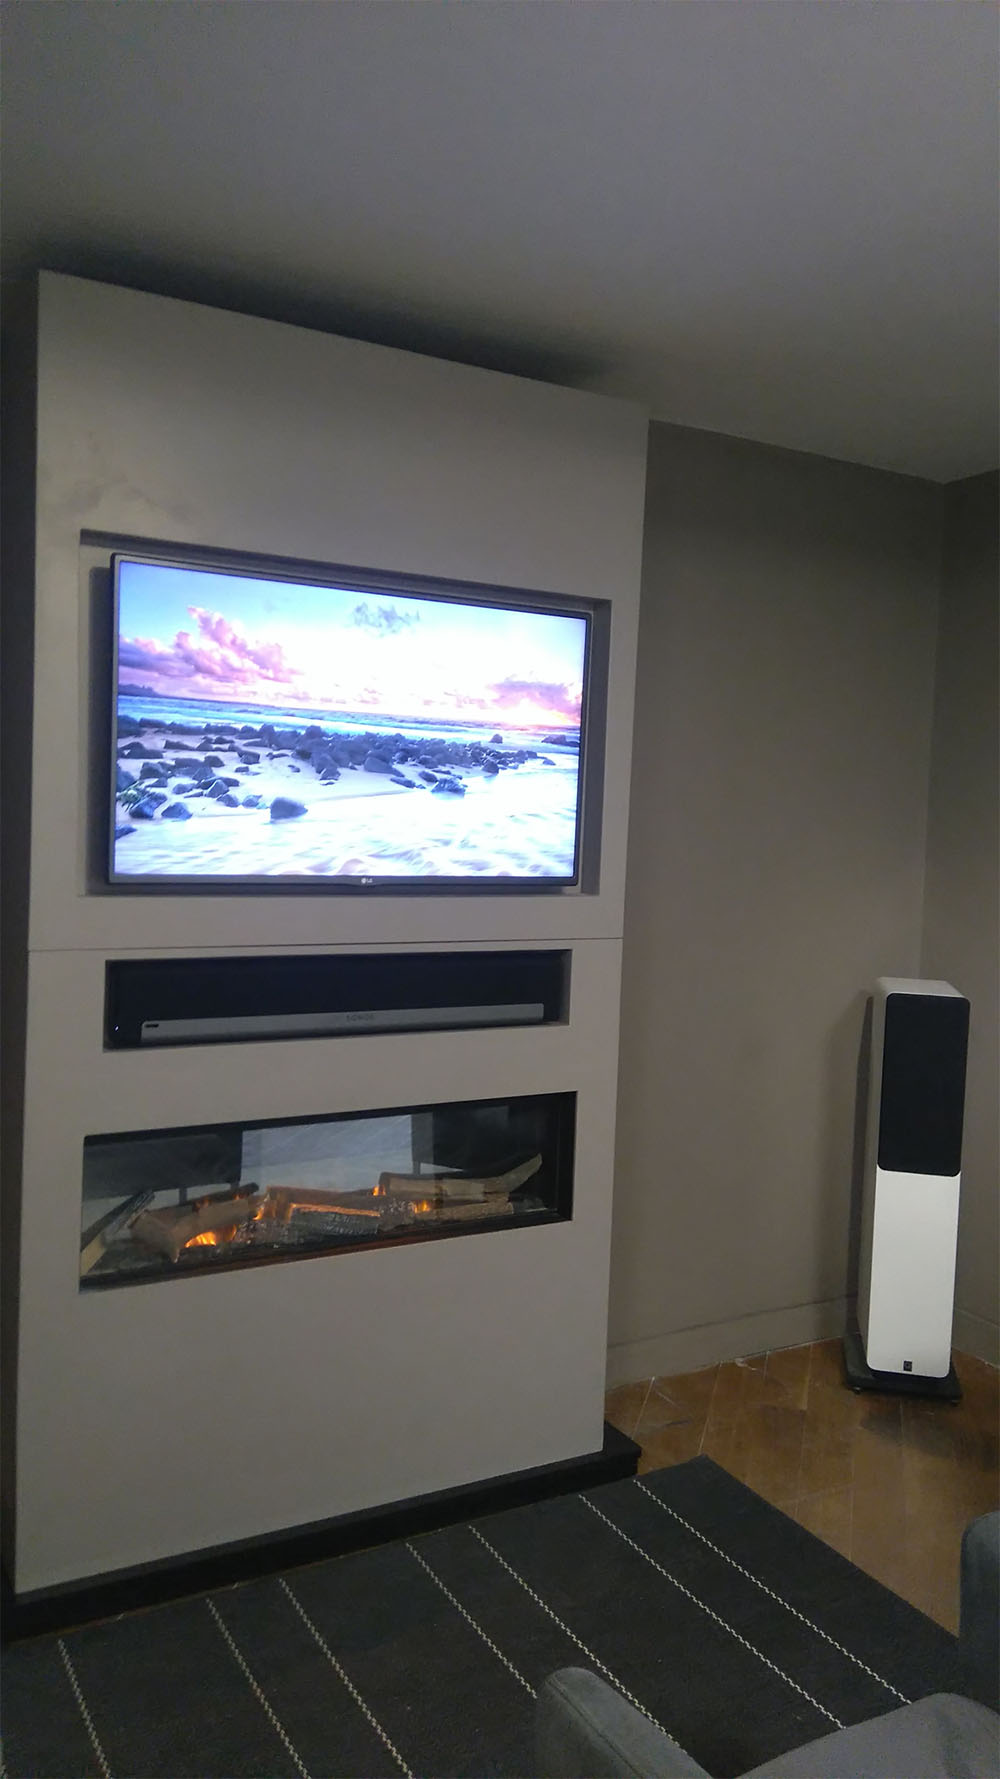 Fireplace Wall Unit Lovely Modular Wall Unit for Tv Fireplace soundbar Thornwood